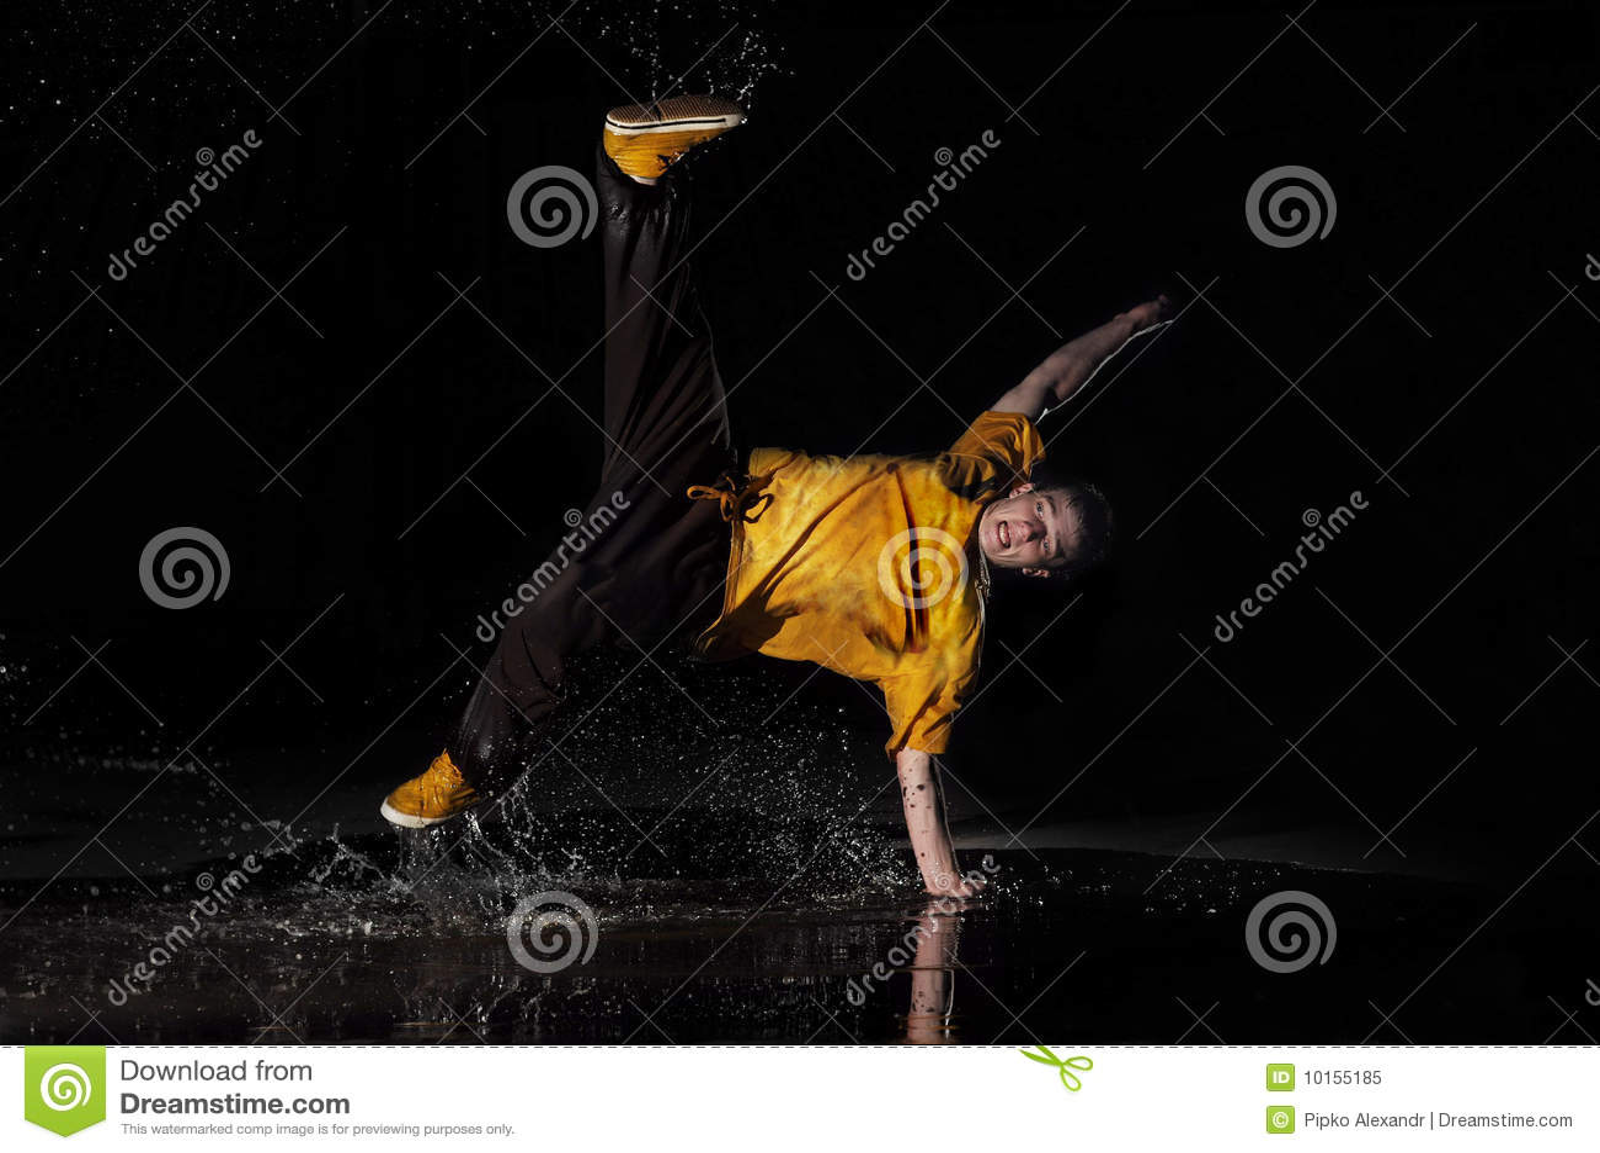 B-jongen dansen in water